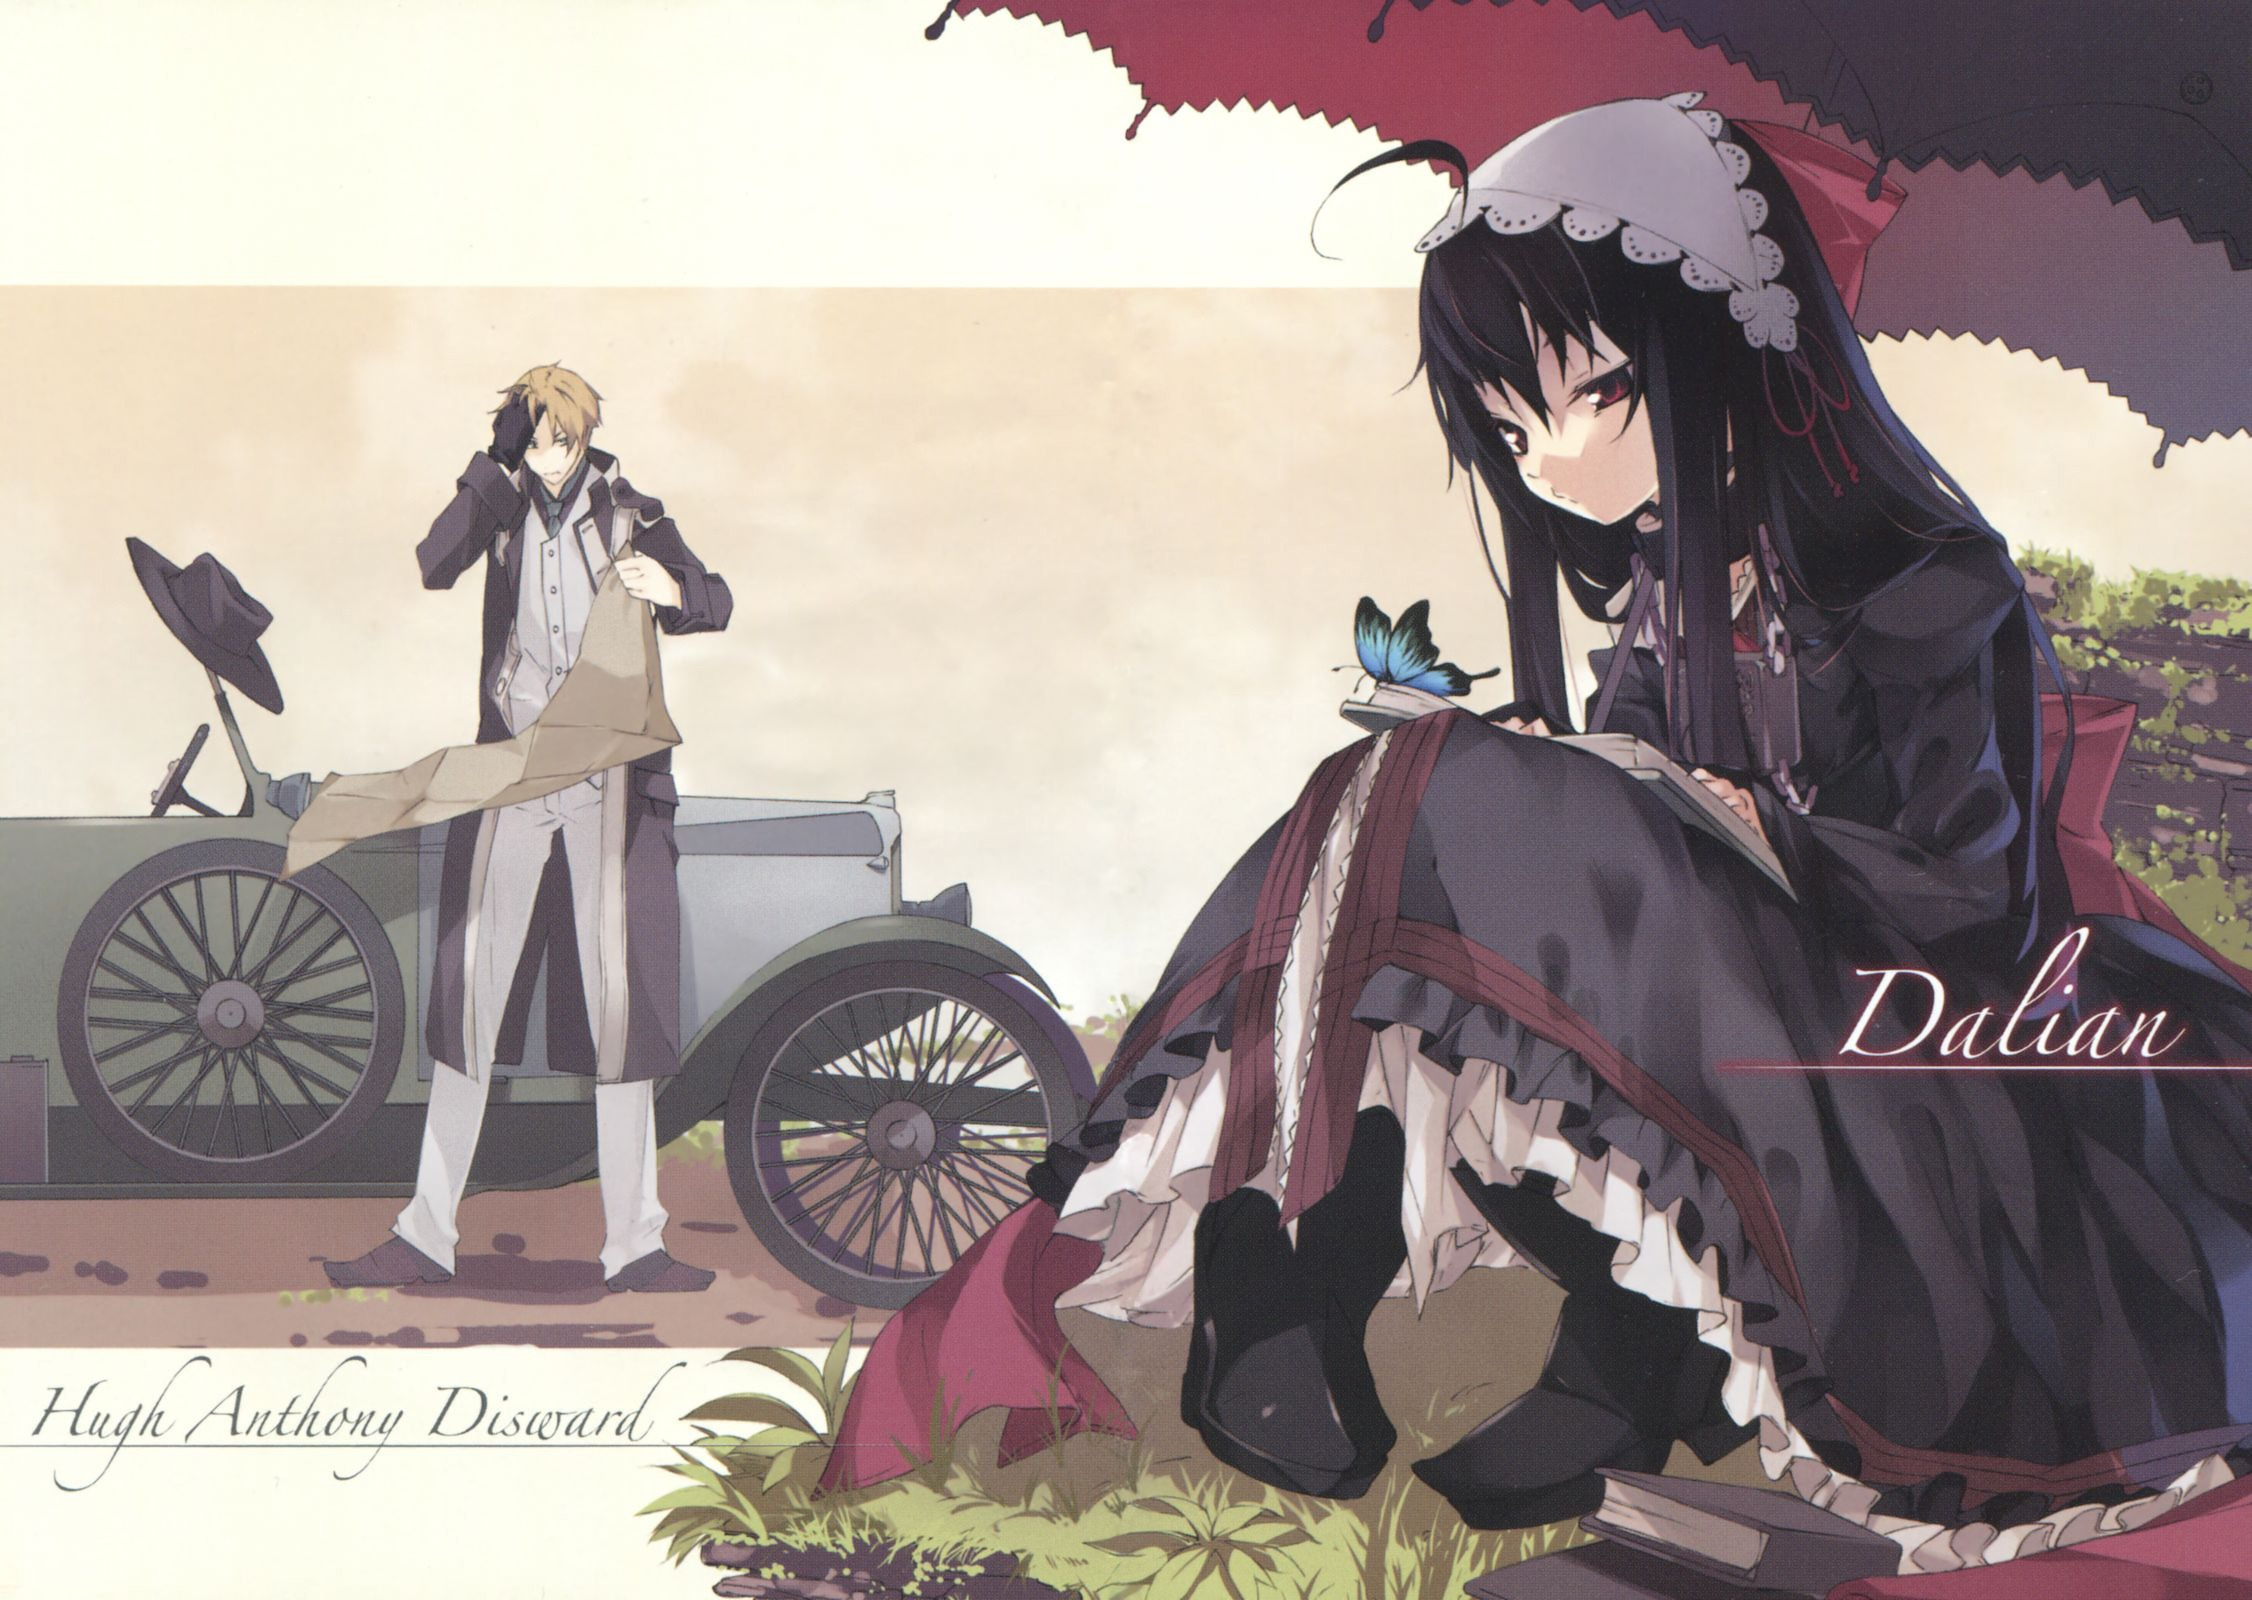 Anime dantalian no shoka online dating